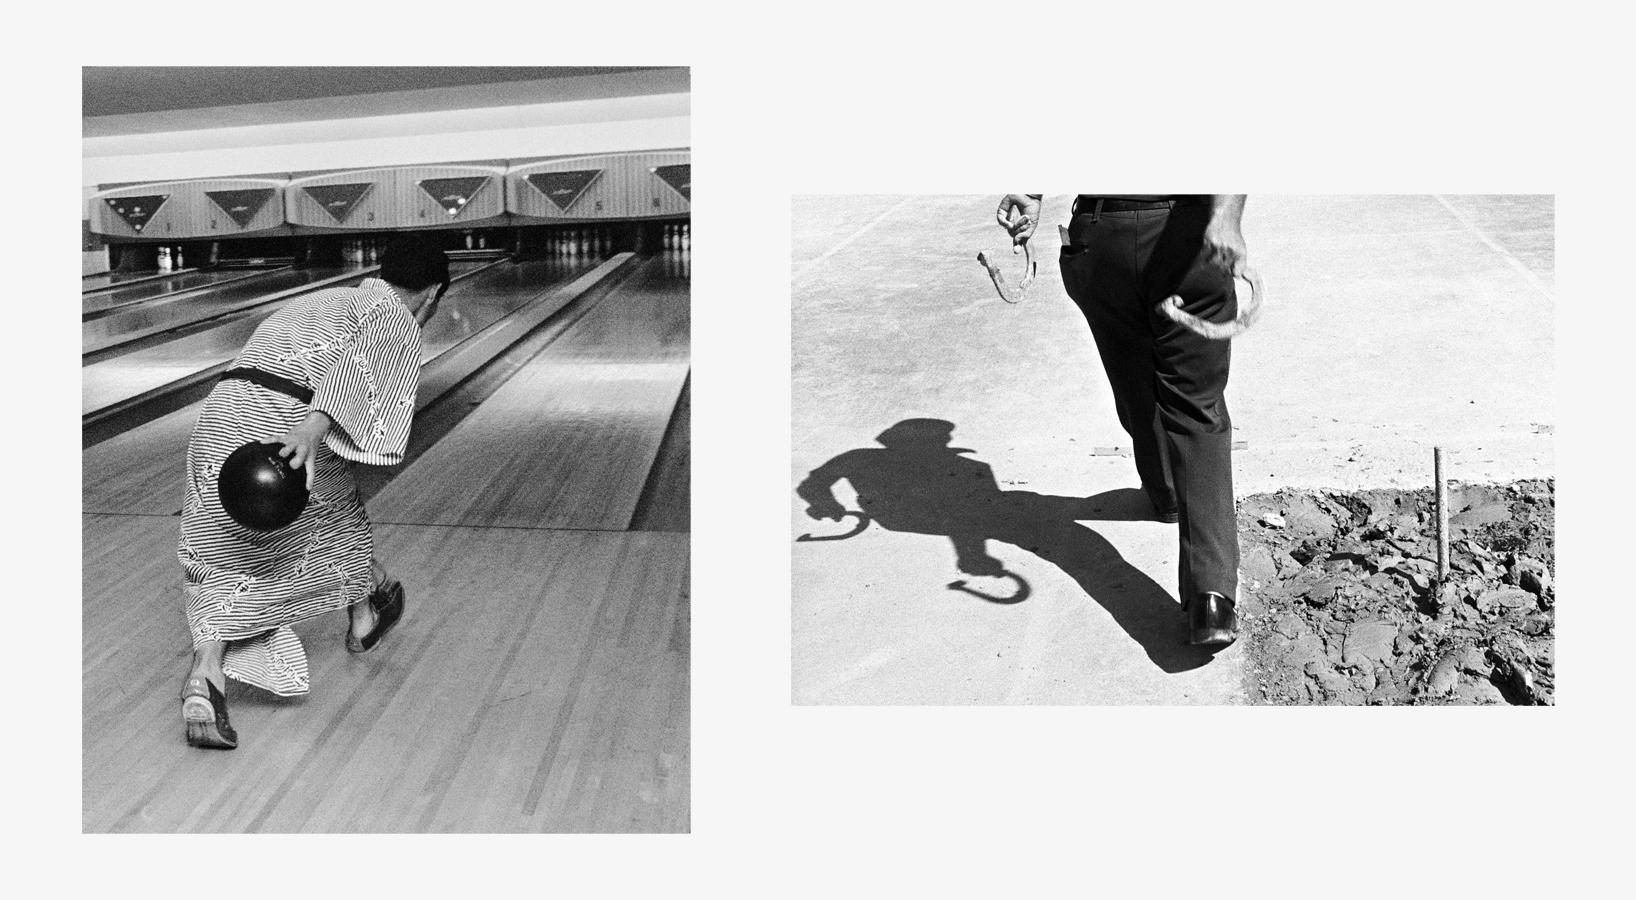 Bowler, Japan, 1978   Pitching Horseshoes, IA, 1974 38 x 21.5.jpg